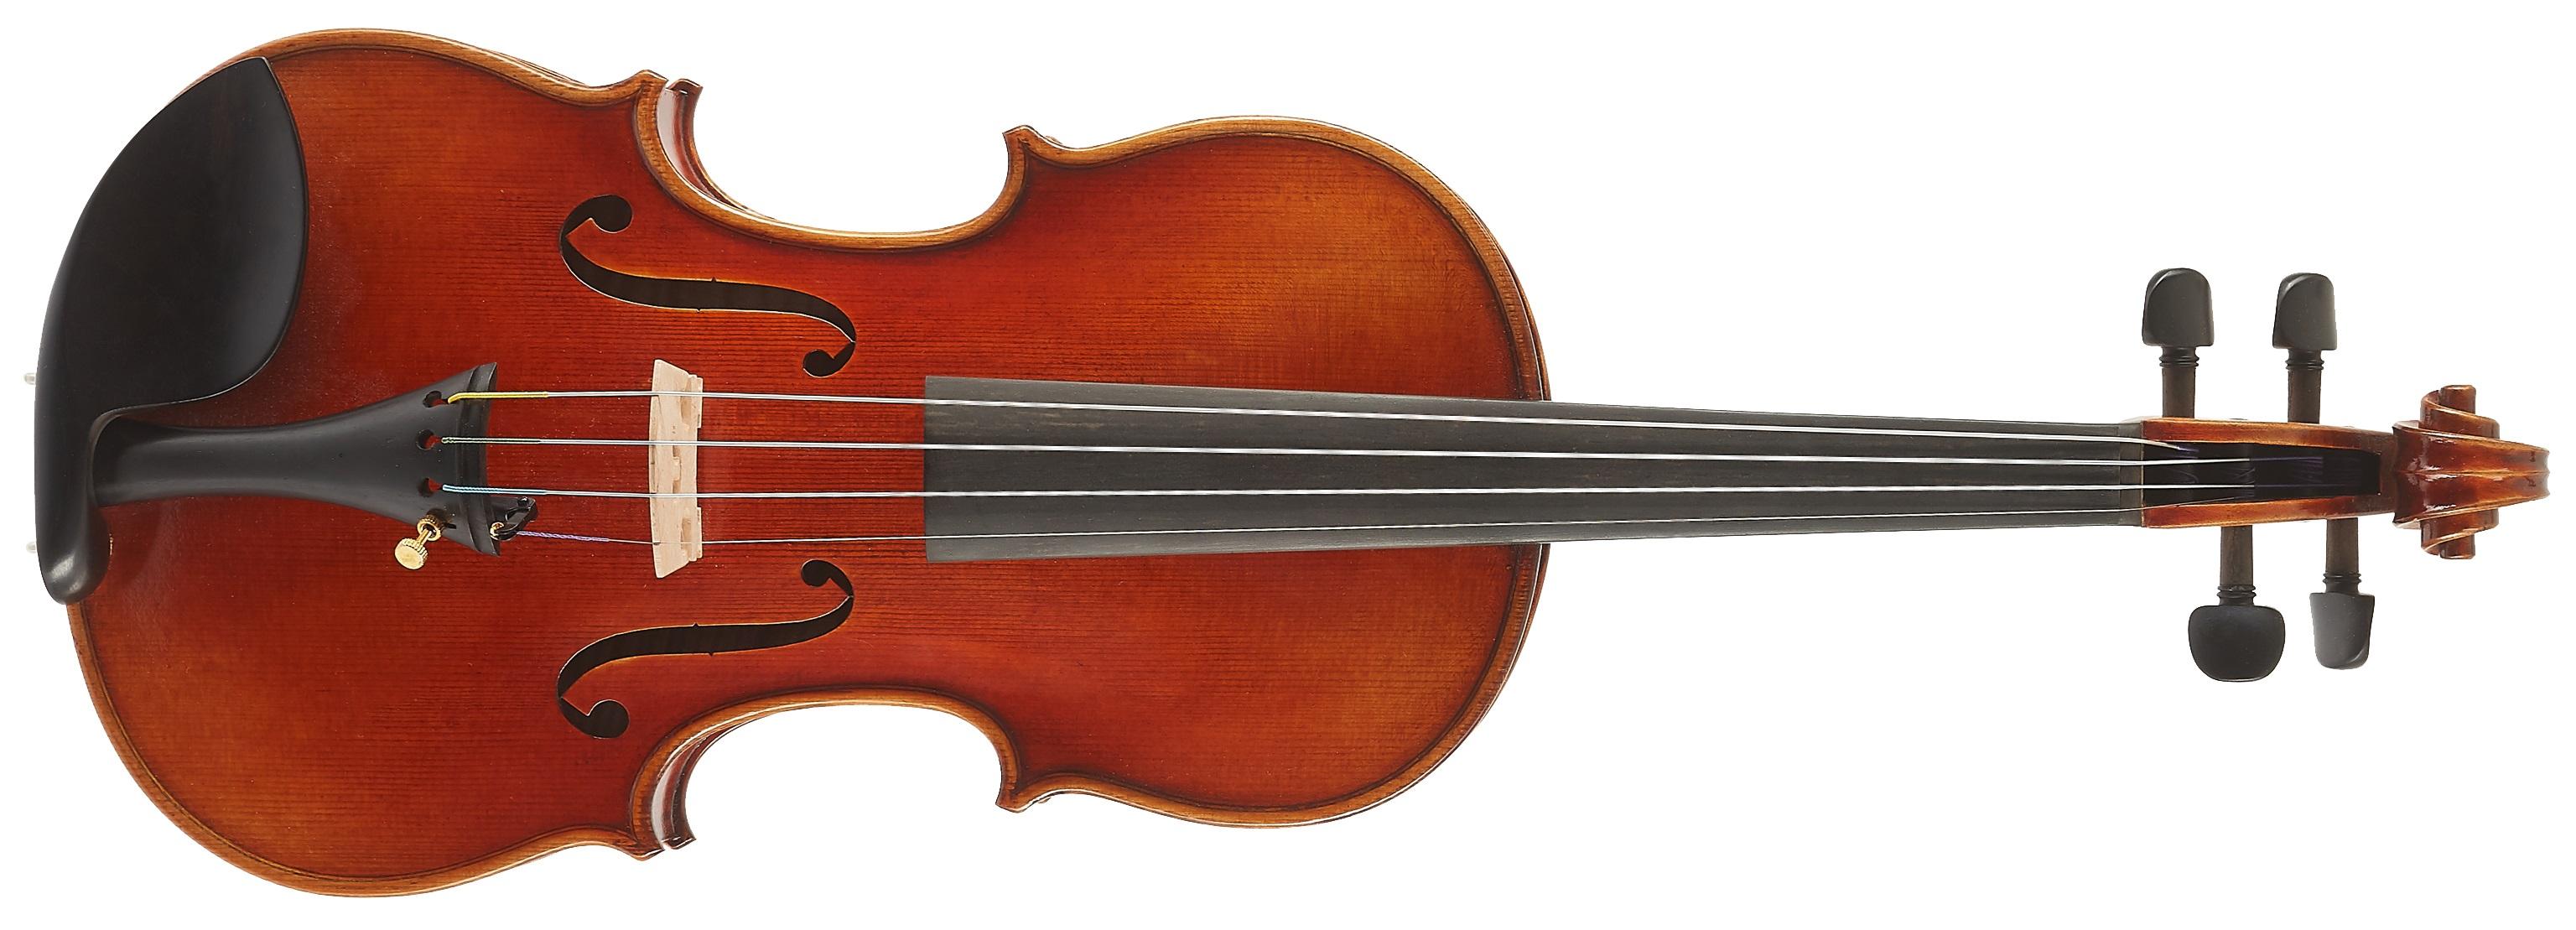 DXKY Custom Stradivari No.2